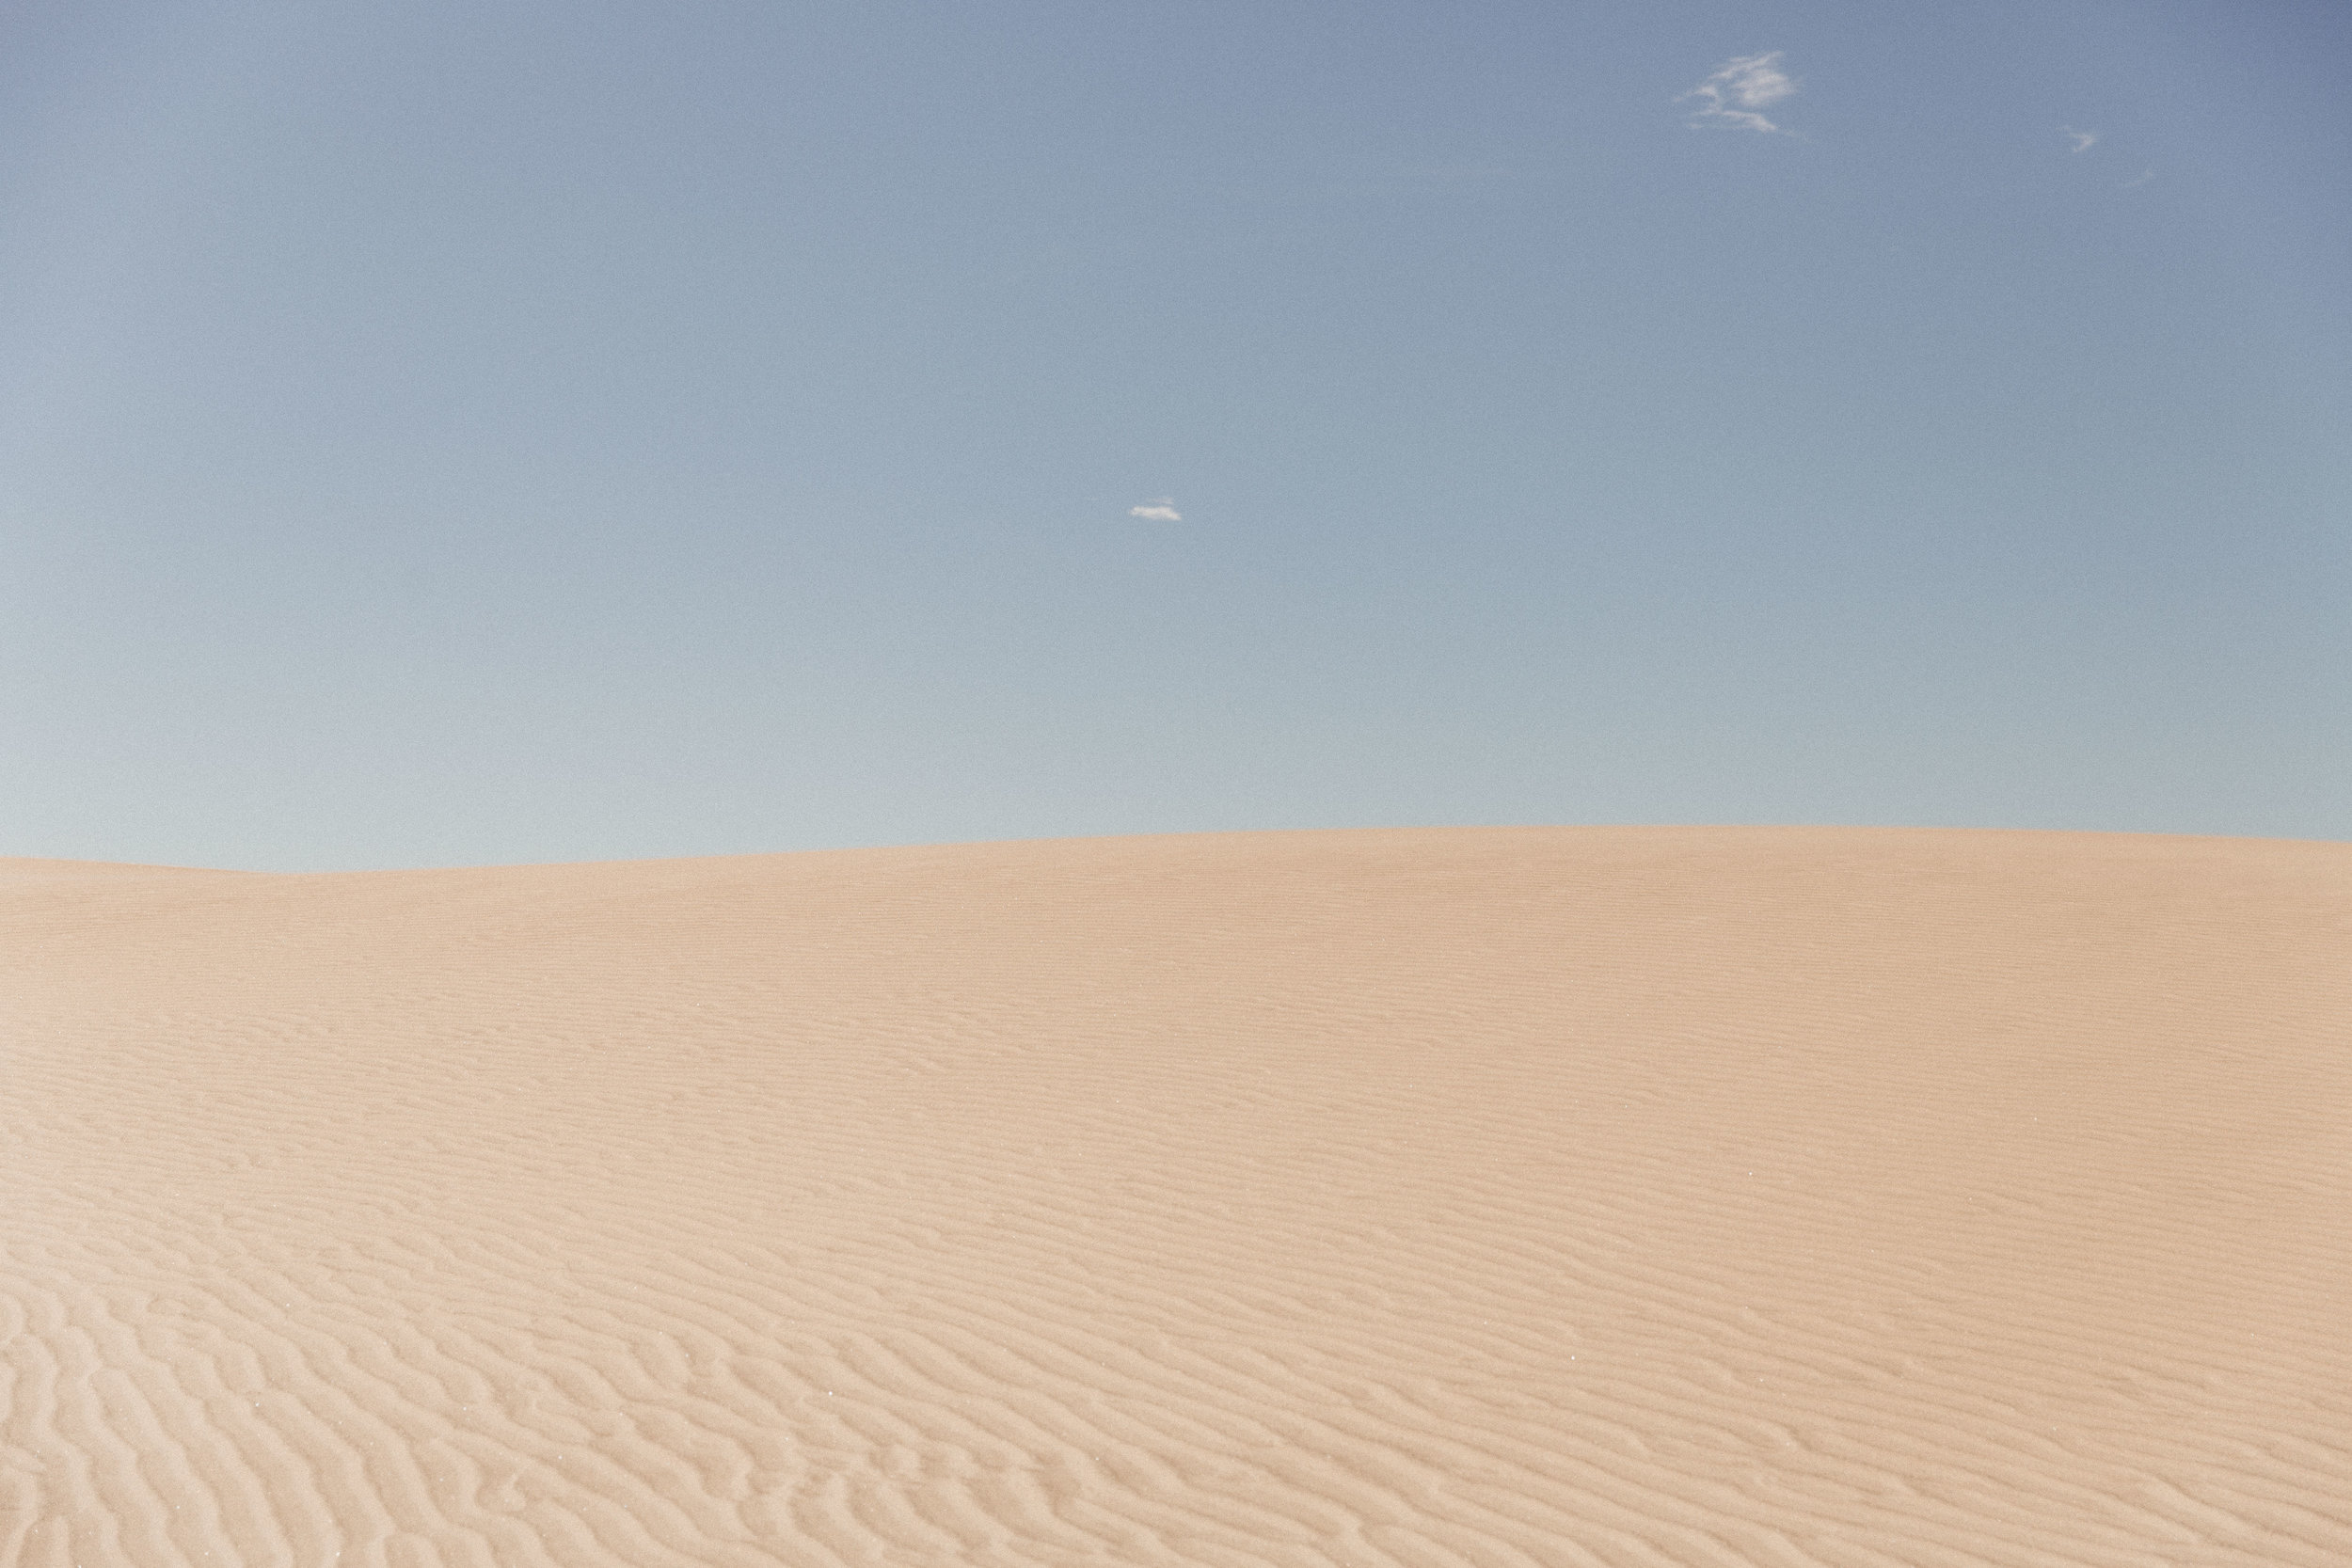 sand-dunes-samlandreth